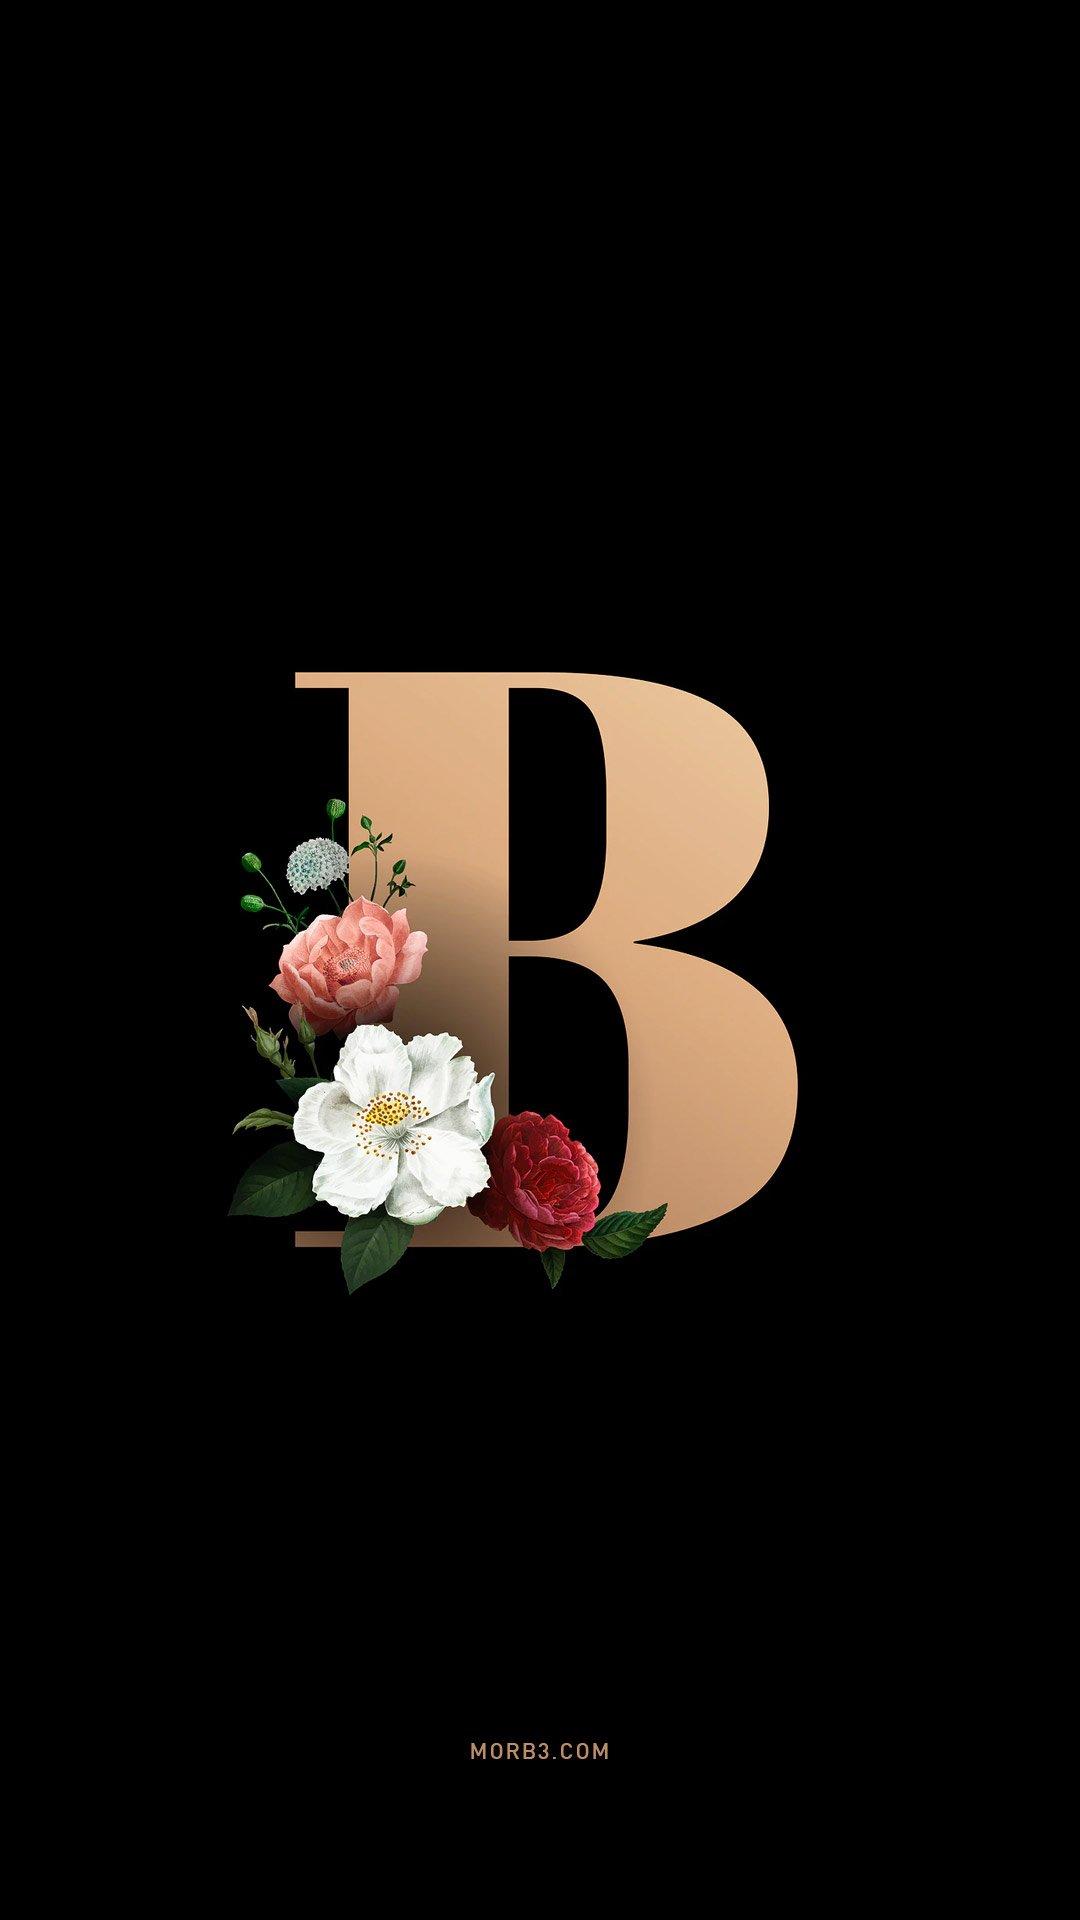 خلفيات ايفون حرف B مربع